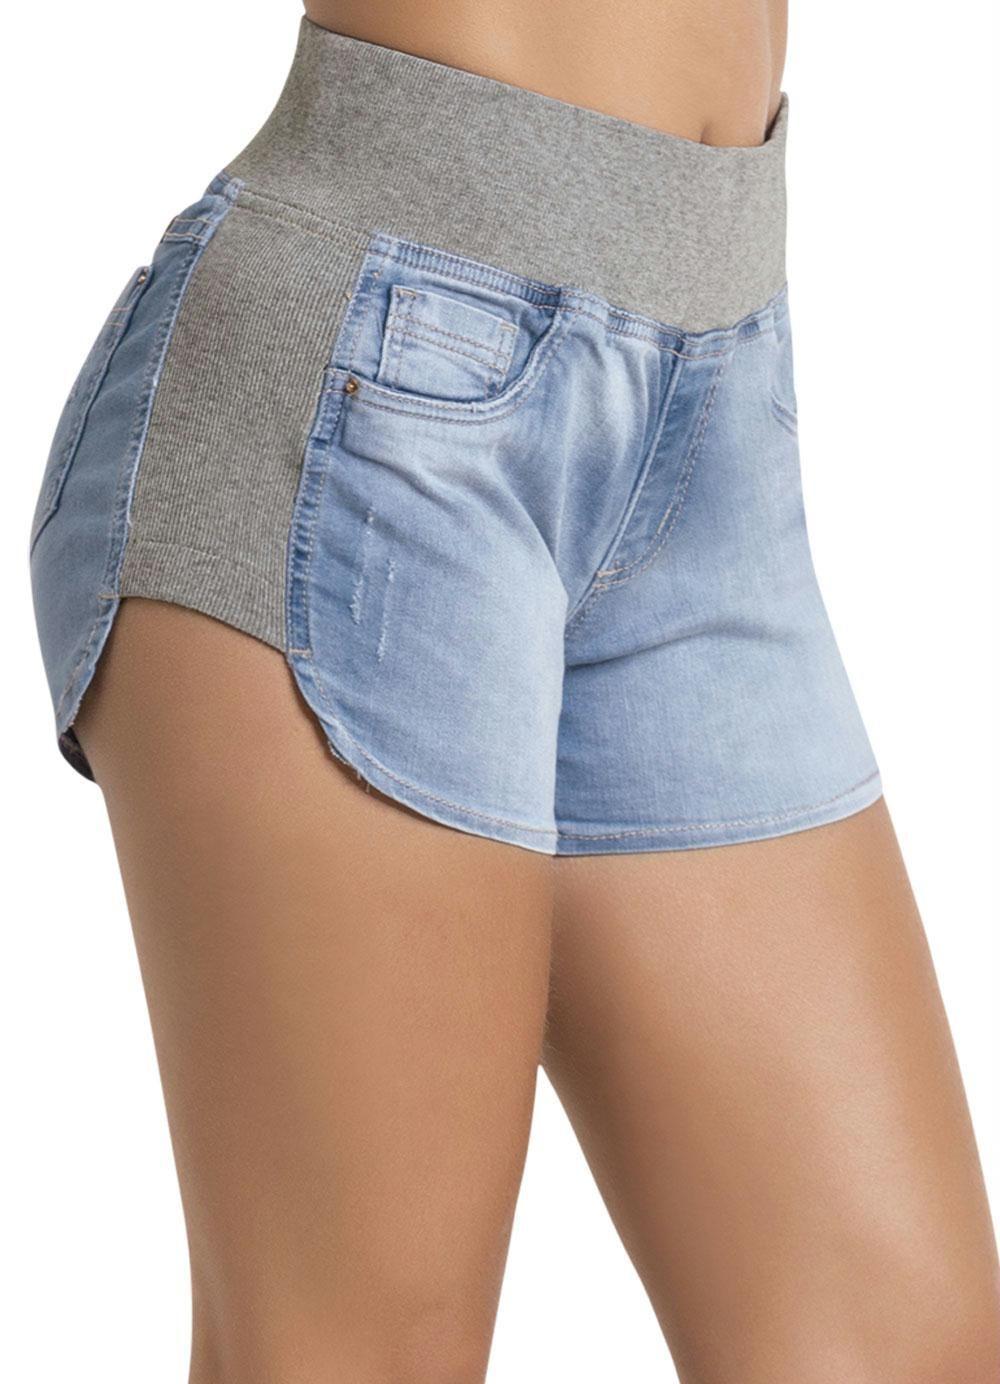 c09a790cf7 Shorts Jeans Sawary Azul e Cinza Boyfriend - Multimarcas. Confeccionado em  jeans com elastano.